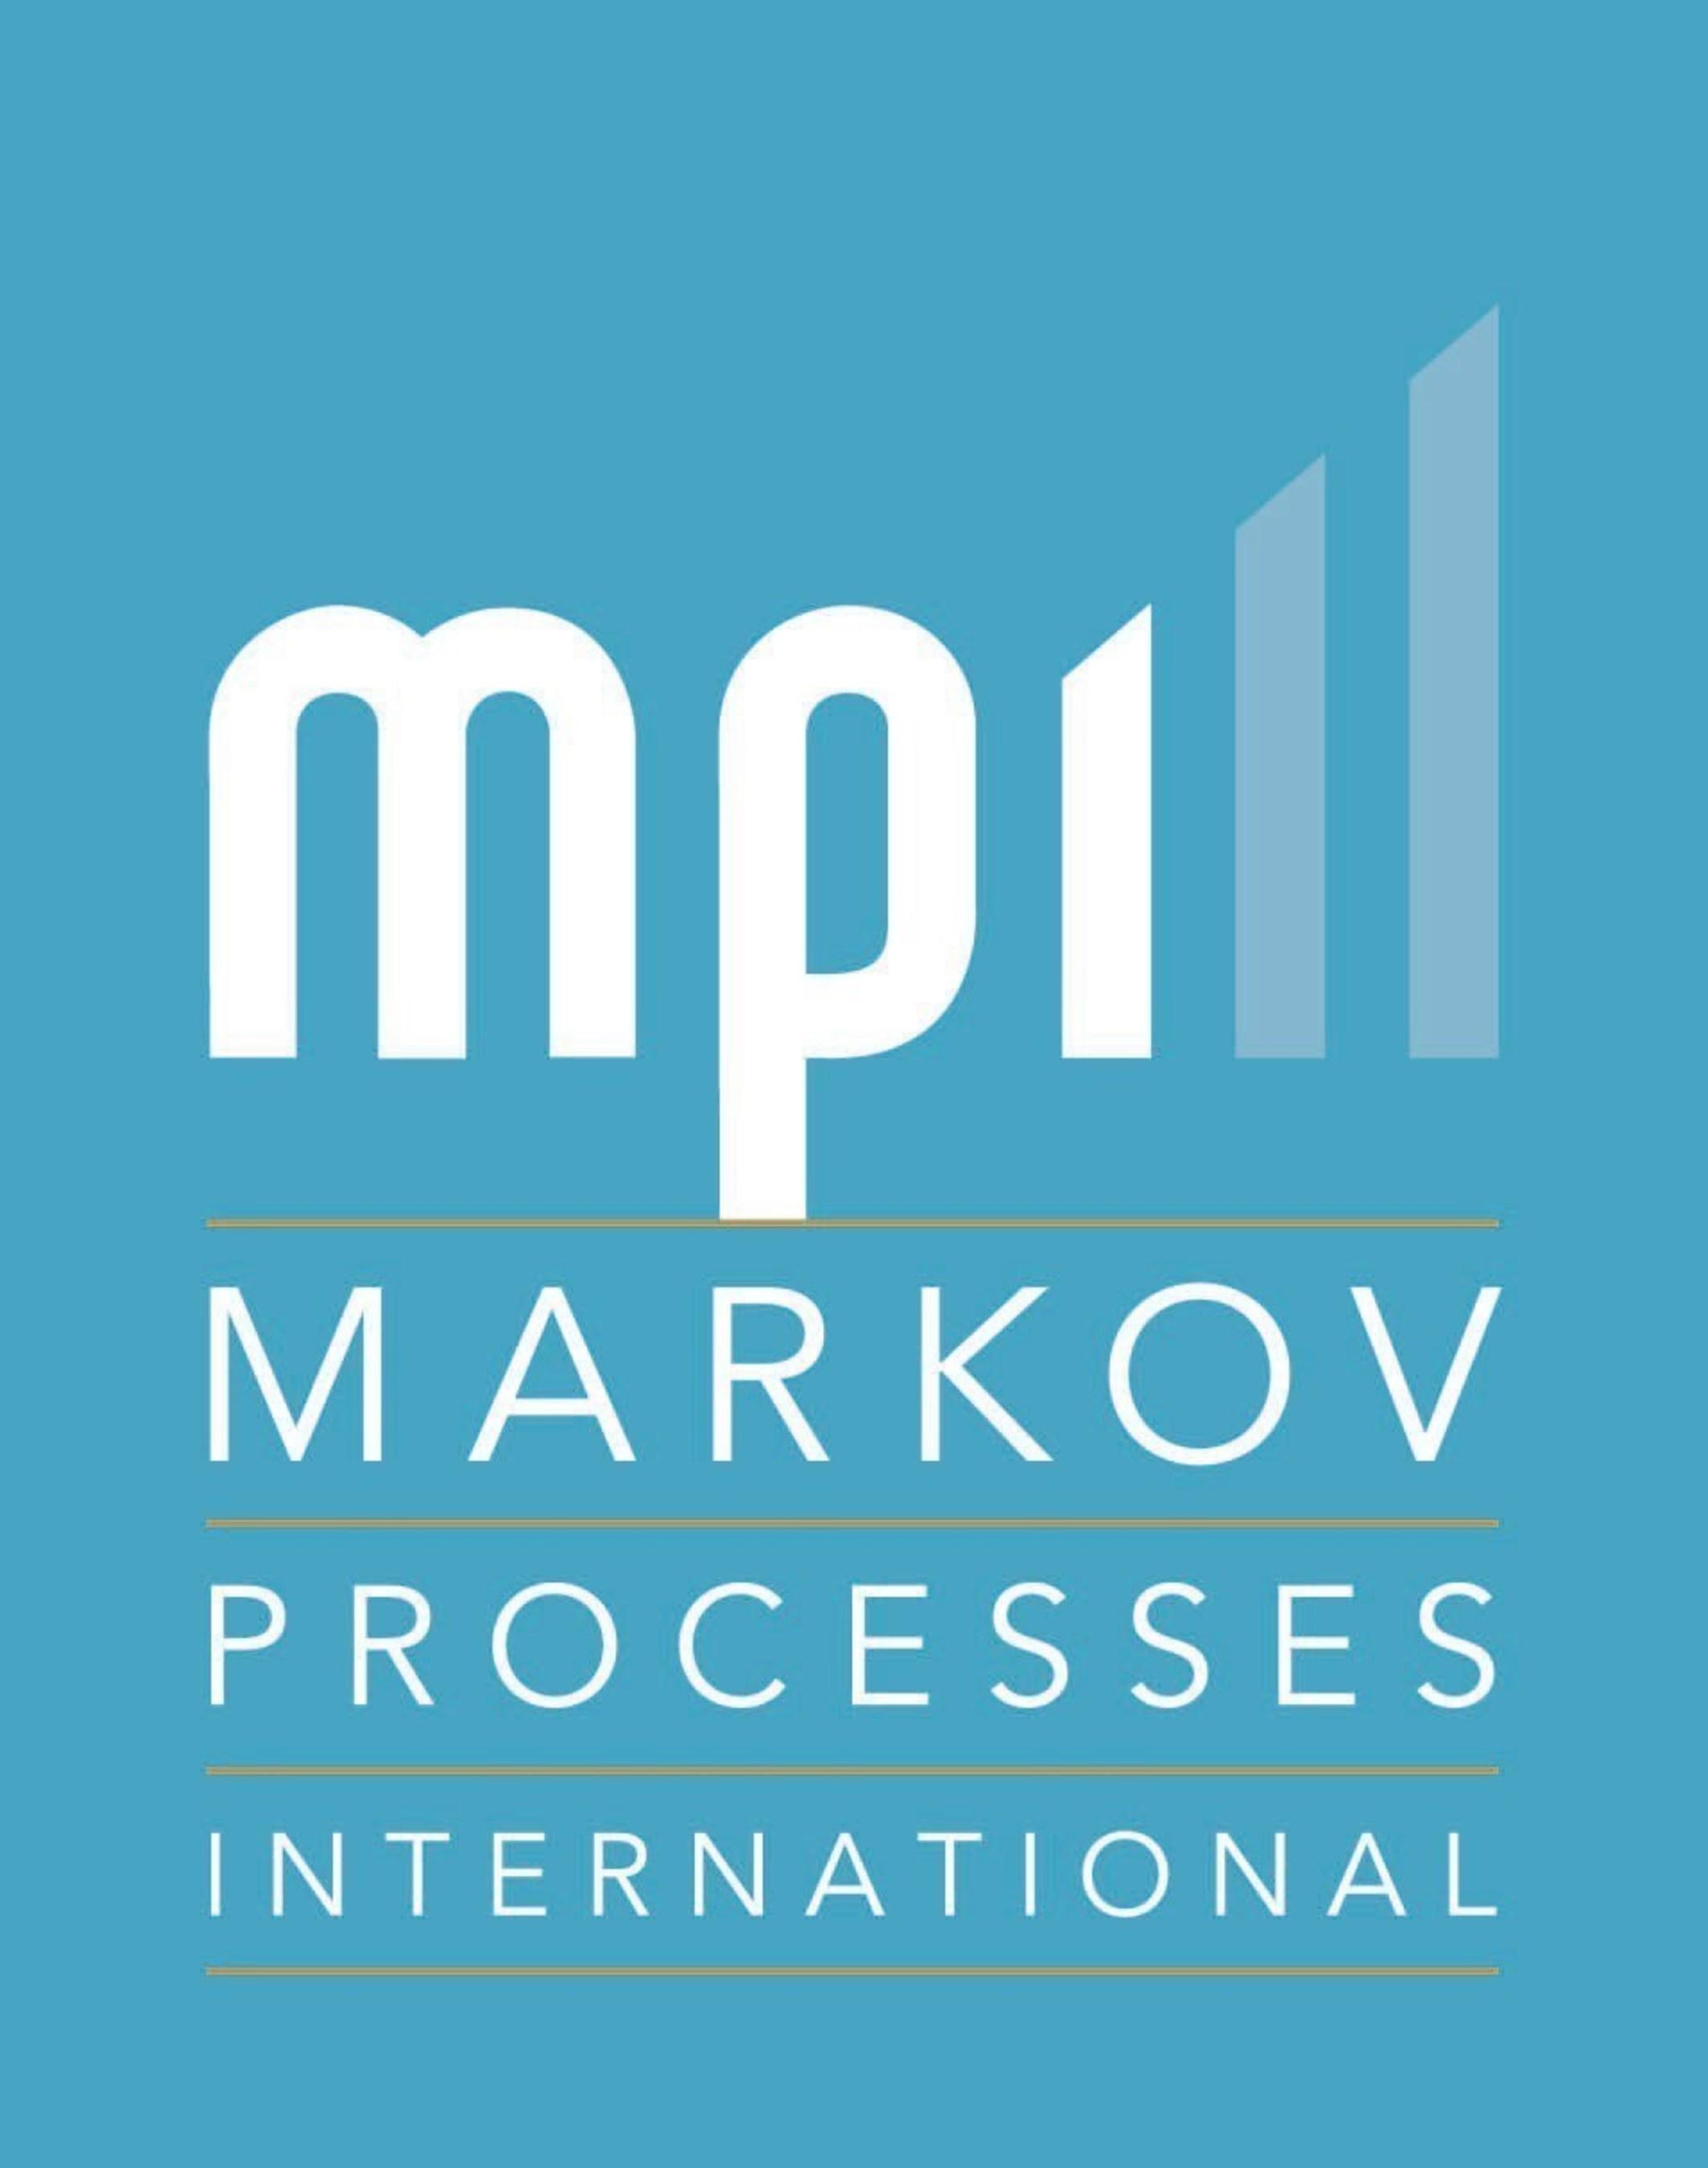 MPI (Markov Processes International, Inc.)